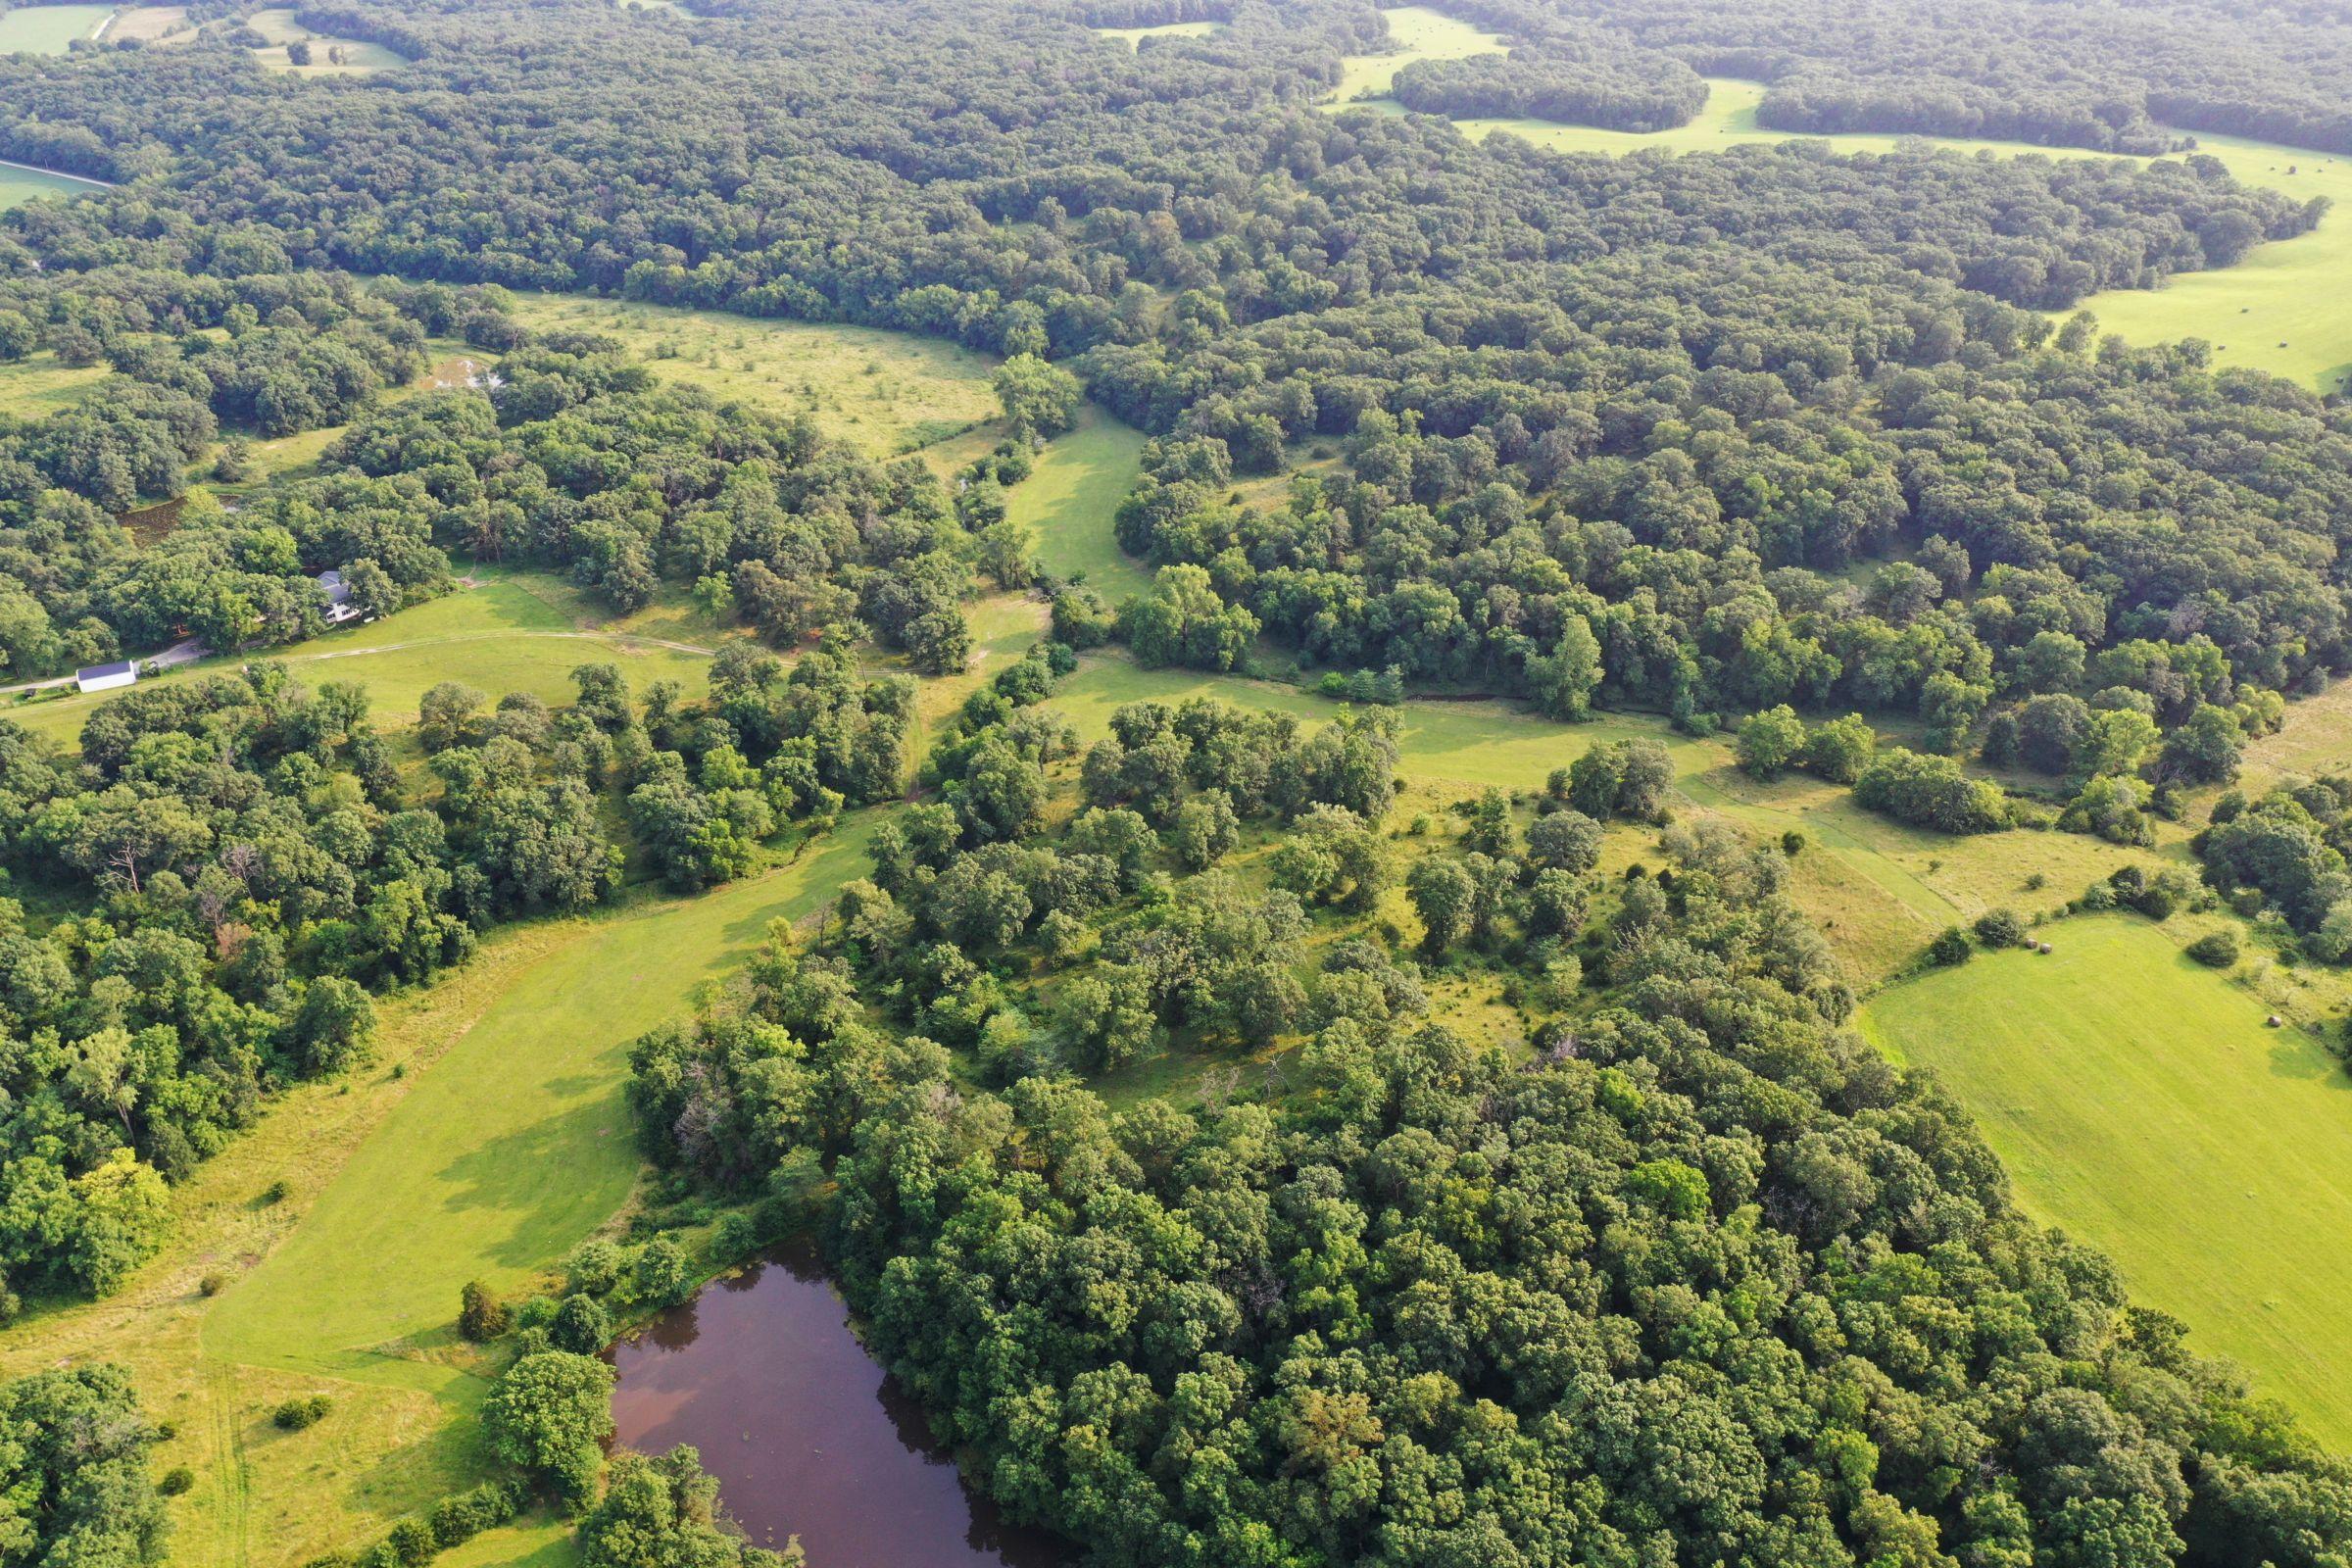 land-lee-county-iowa-340-acres-listing-number-15649-4-2021-07-21-185911.jpg